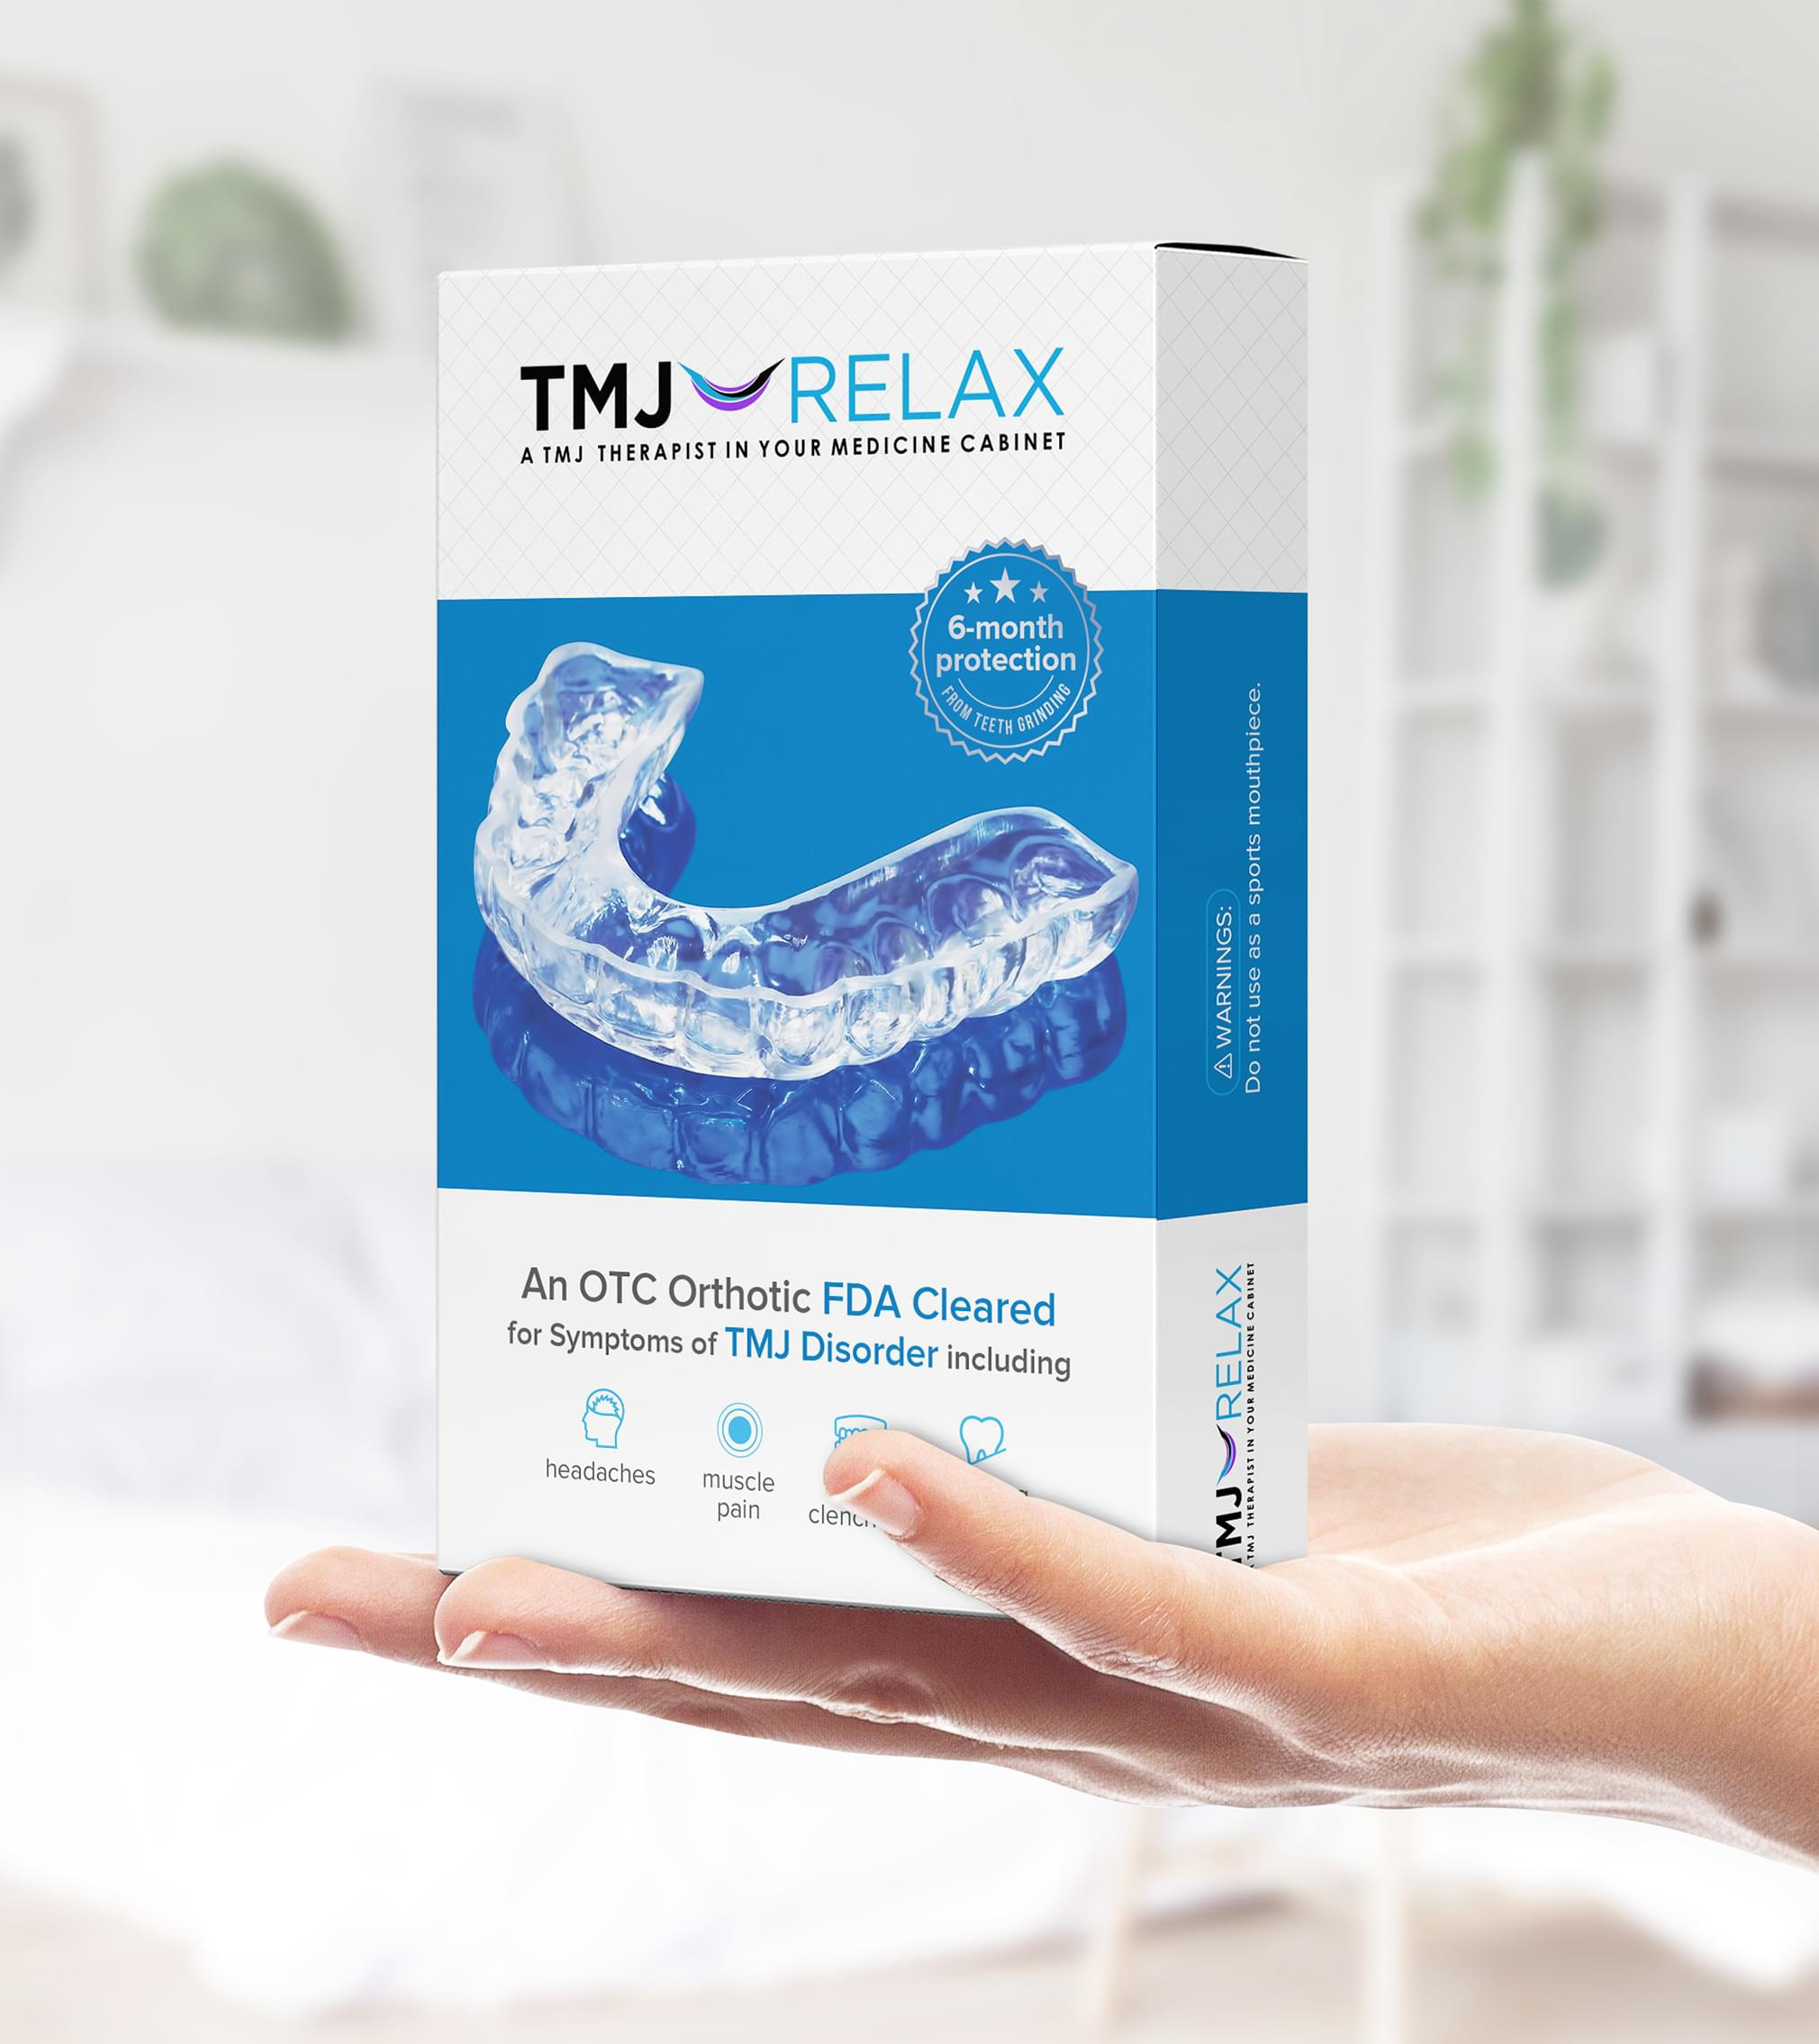 TMJ RELAX Packaging